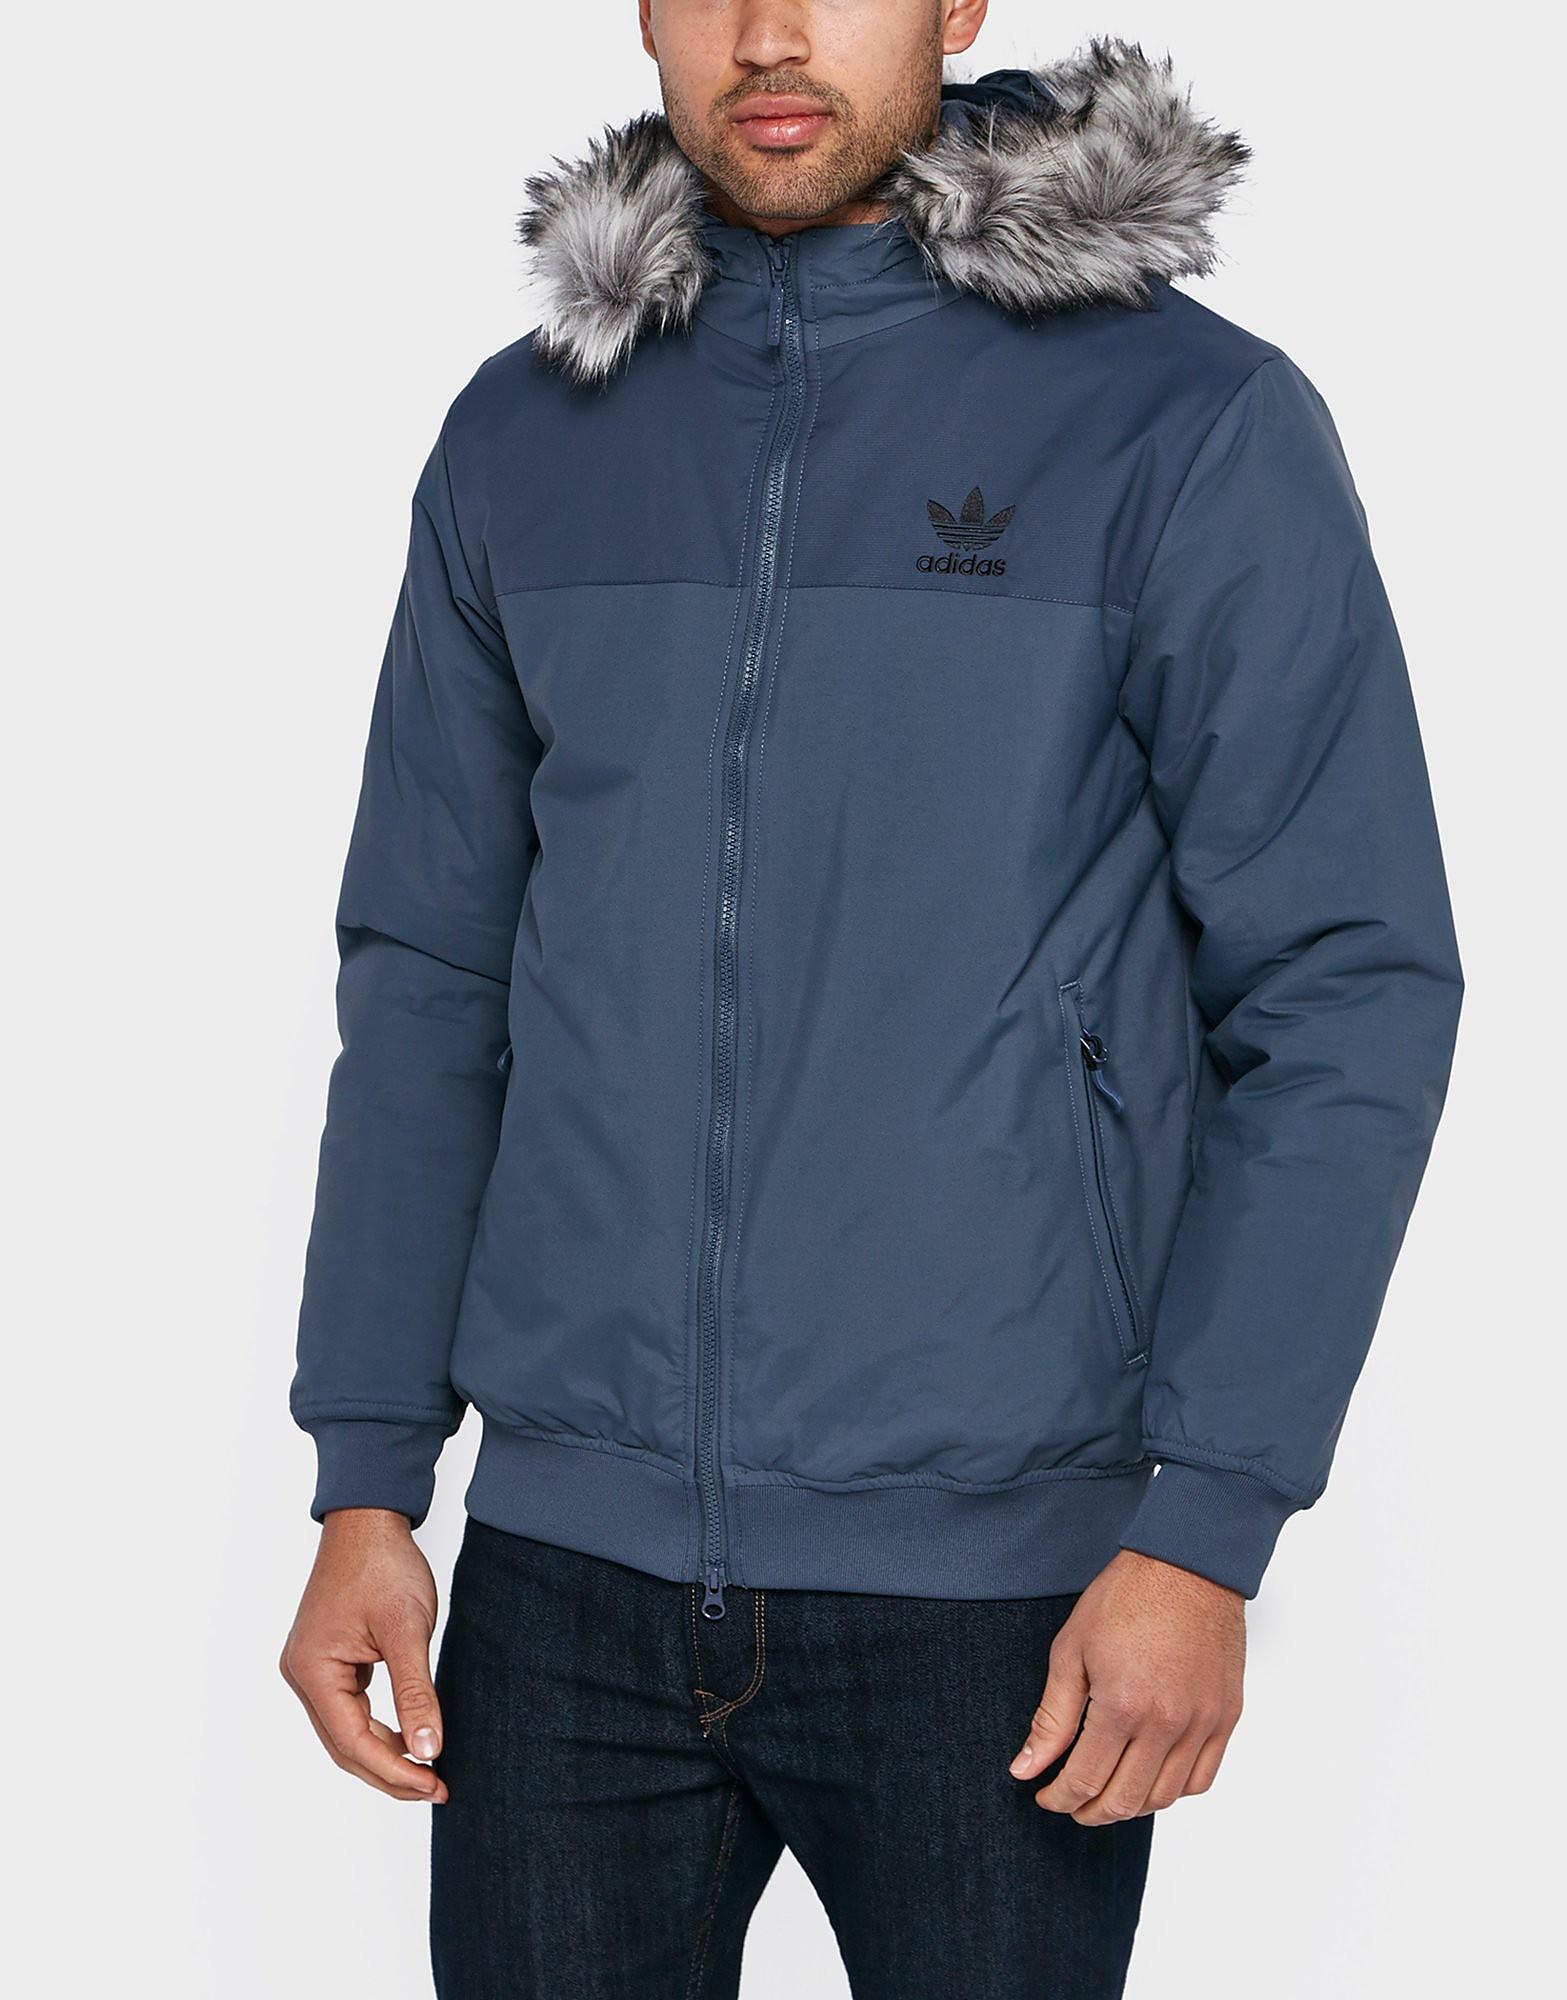 adidas Originals Trefoil Fur Parka  Blue Blue